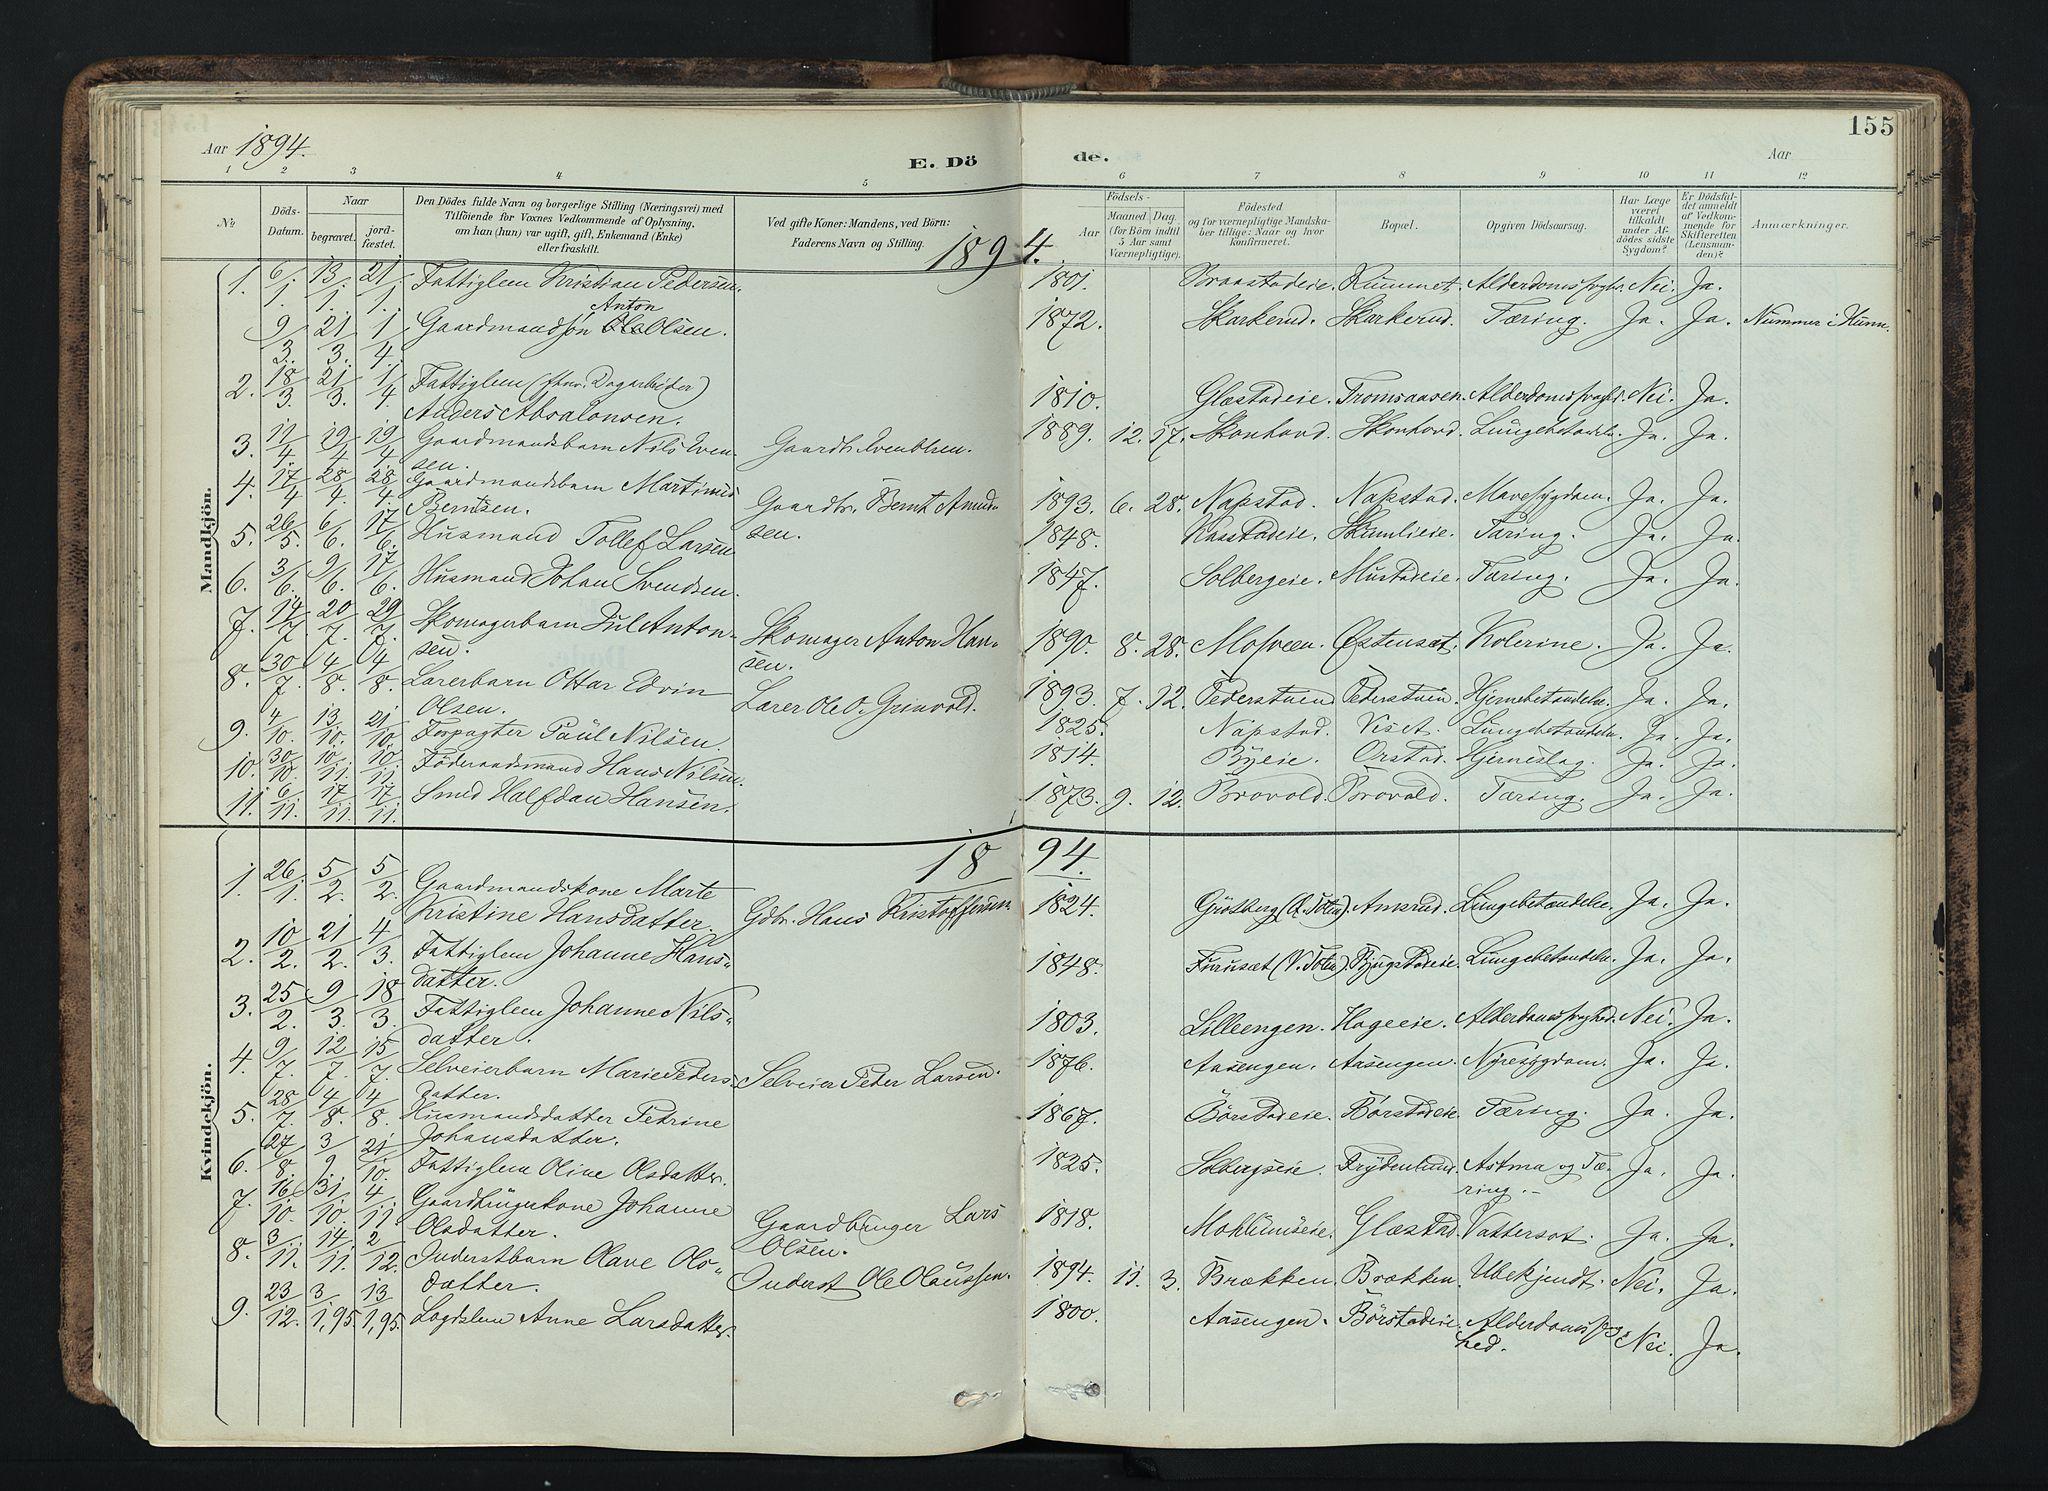 SAH, Vardal prestekontor, H/Ha/Haa/L0019: Ministerialbok nr. 19, 1893-1907, s. 155